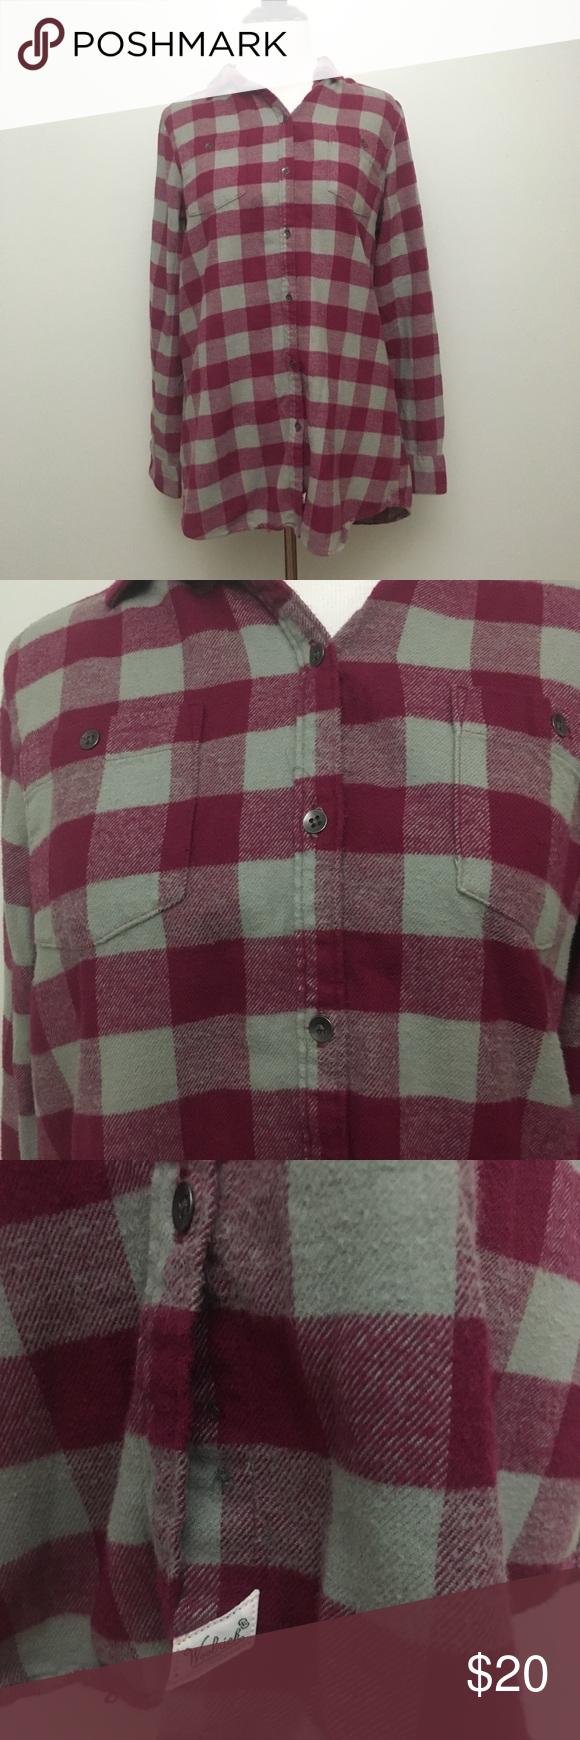 Woolrich flannel button down xs in my poshmark closet